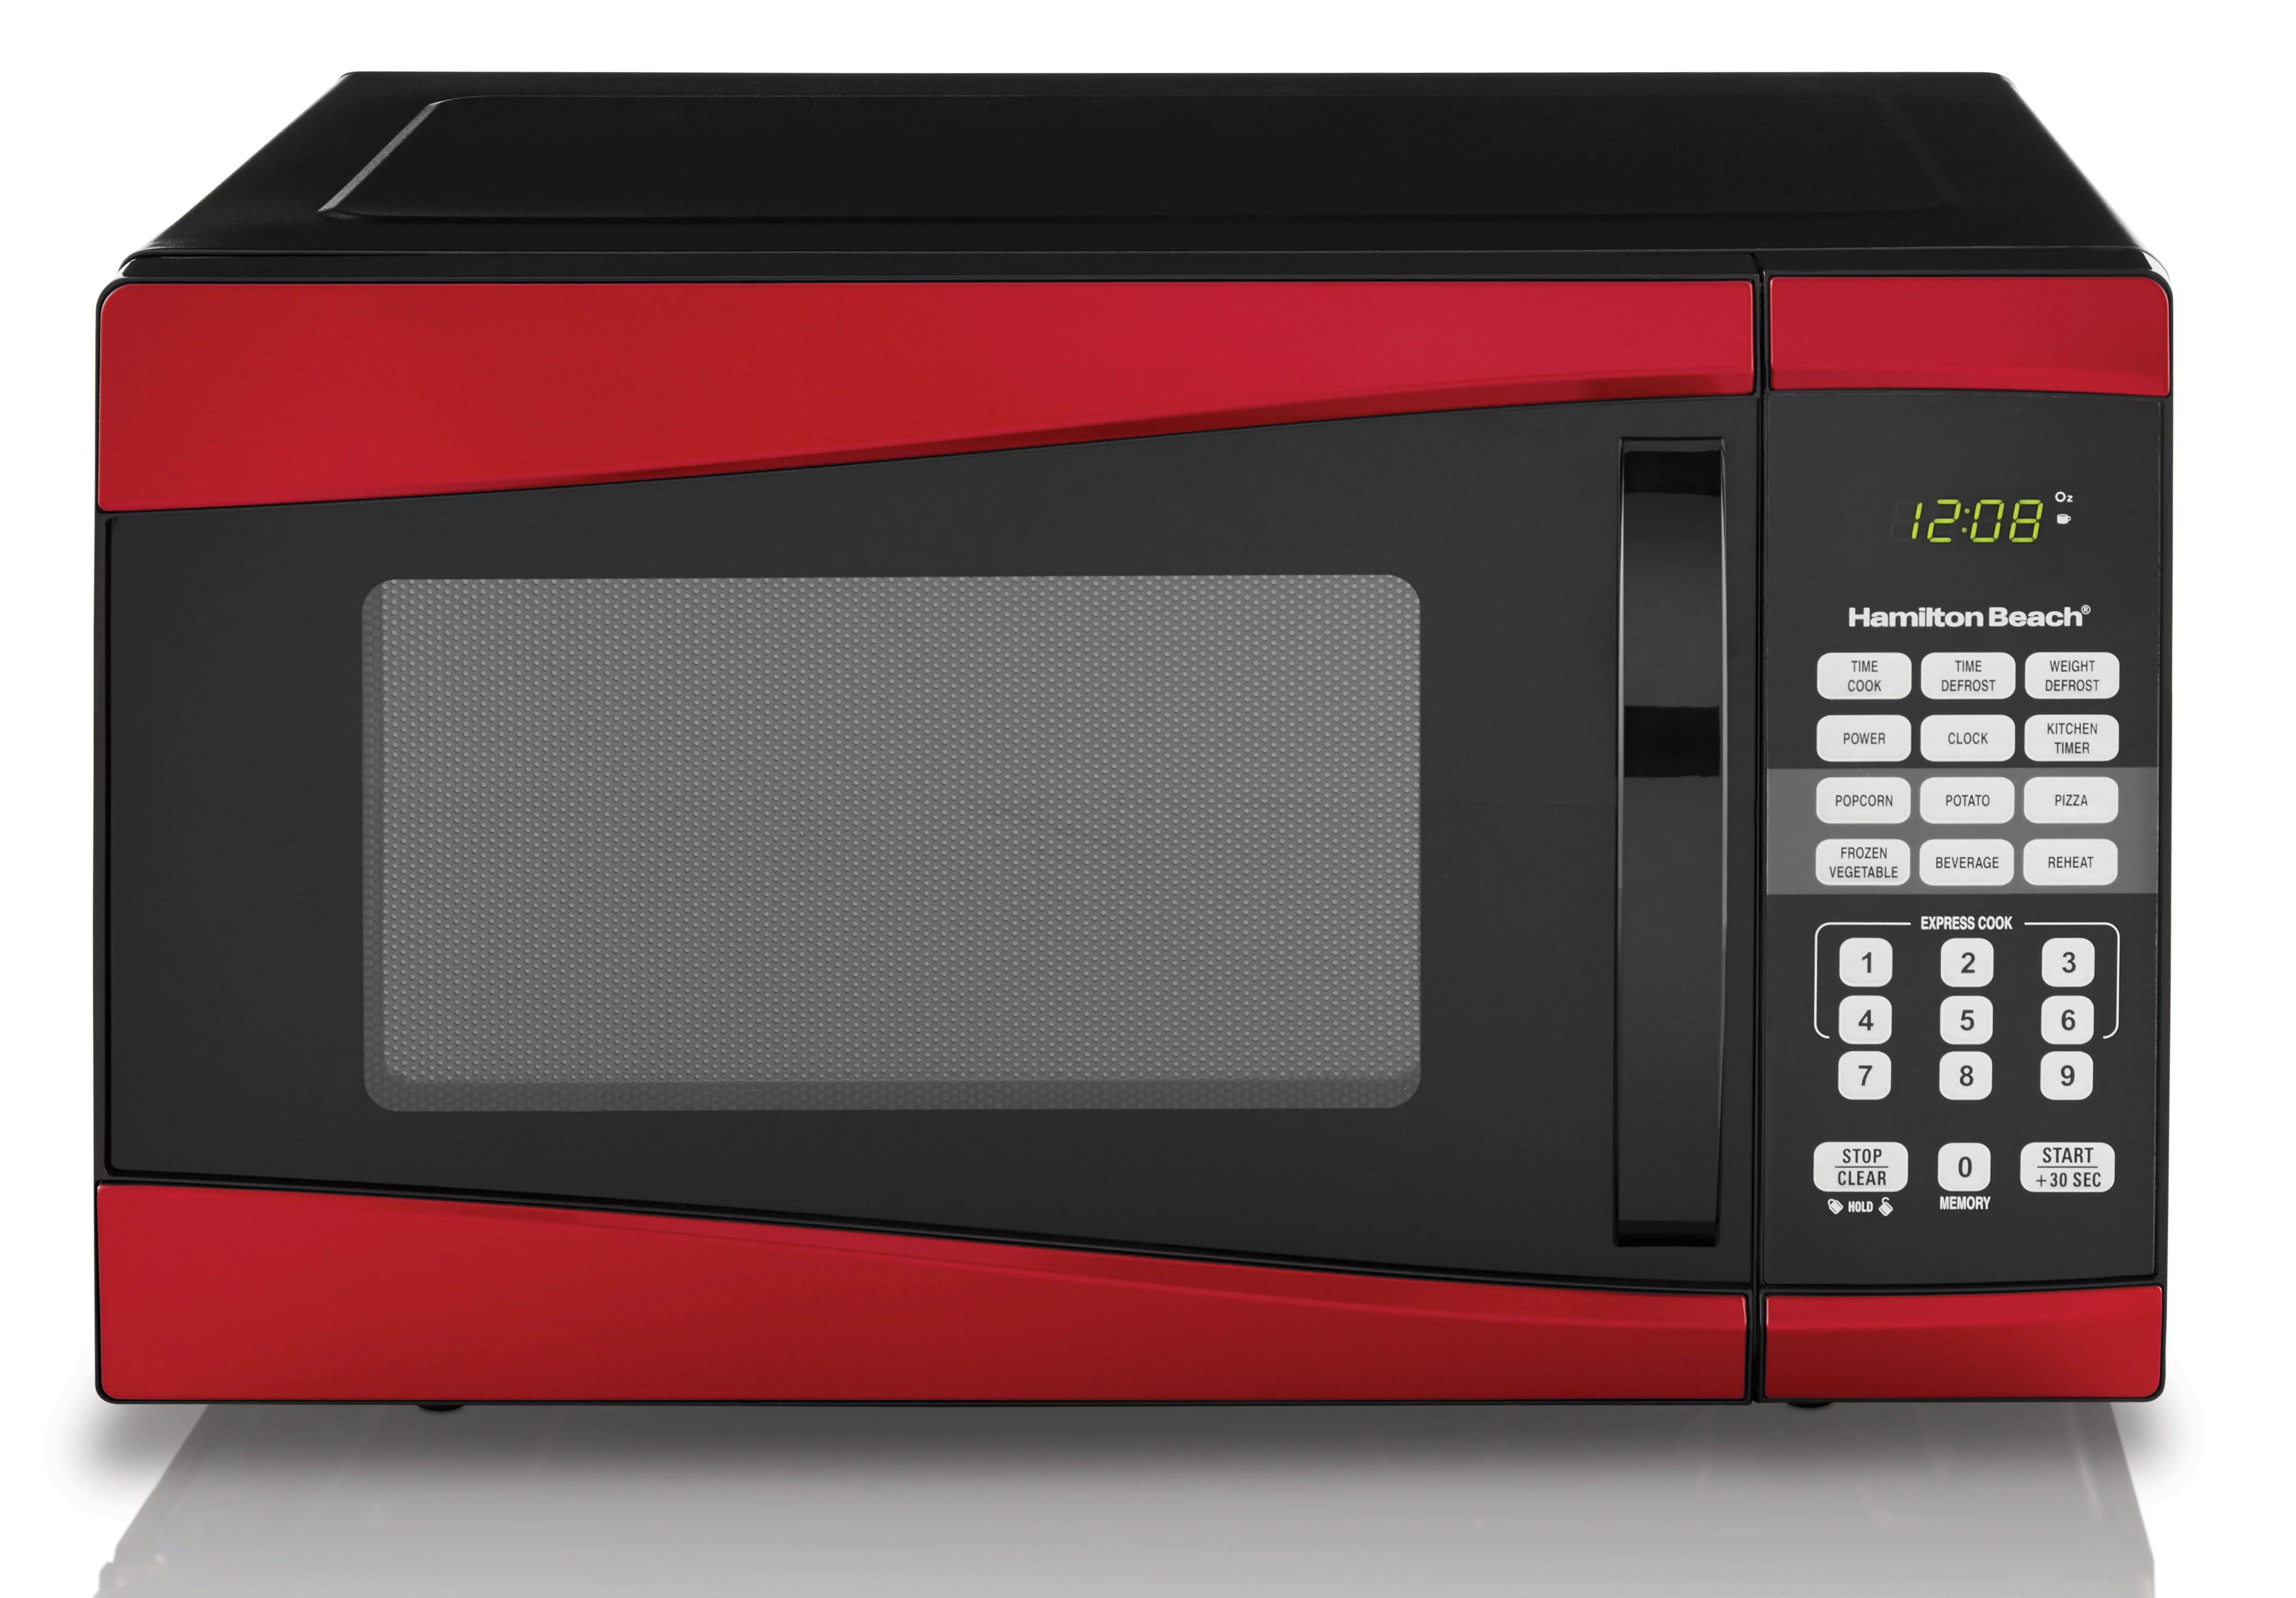 hamilton beach 0 9 cu ft 900w red microwave walmart com walmart com